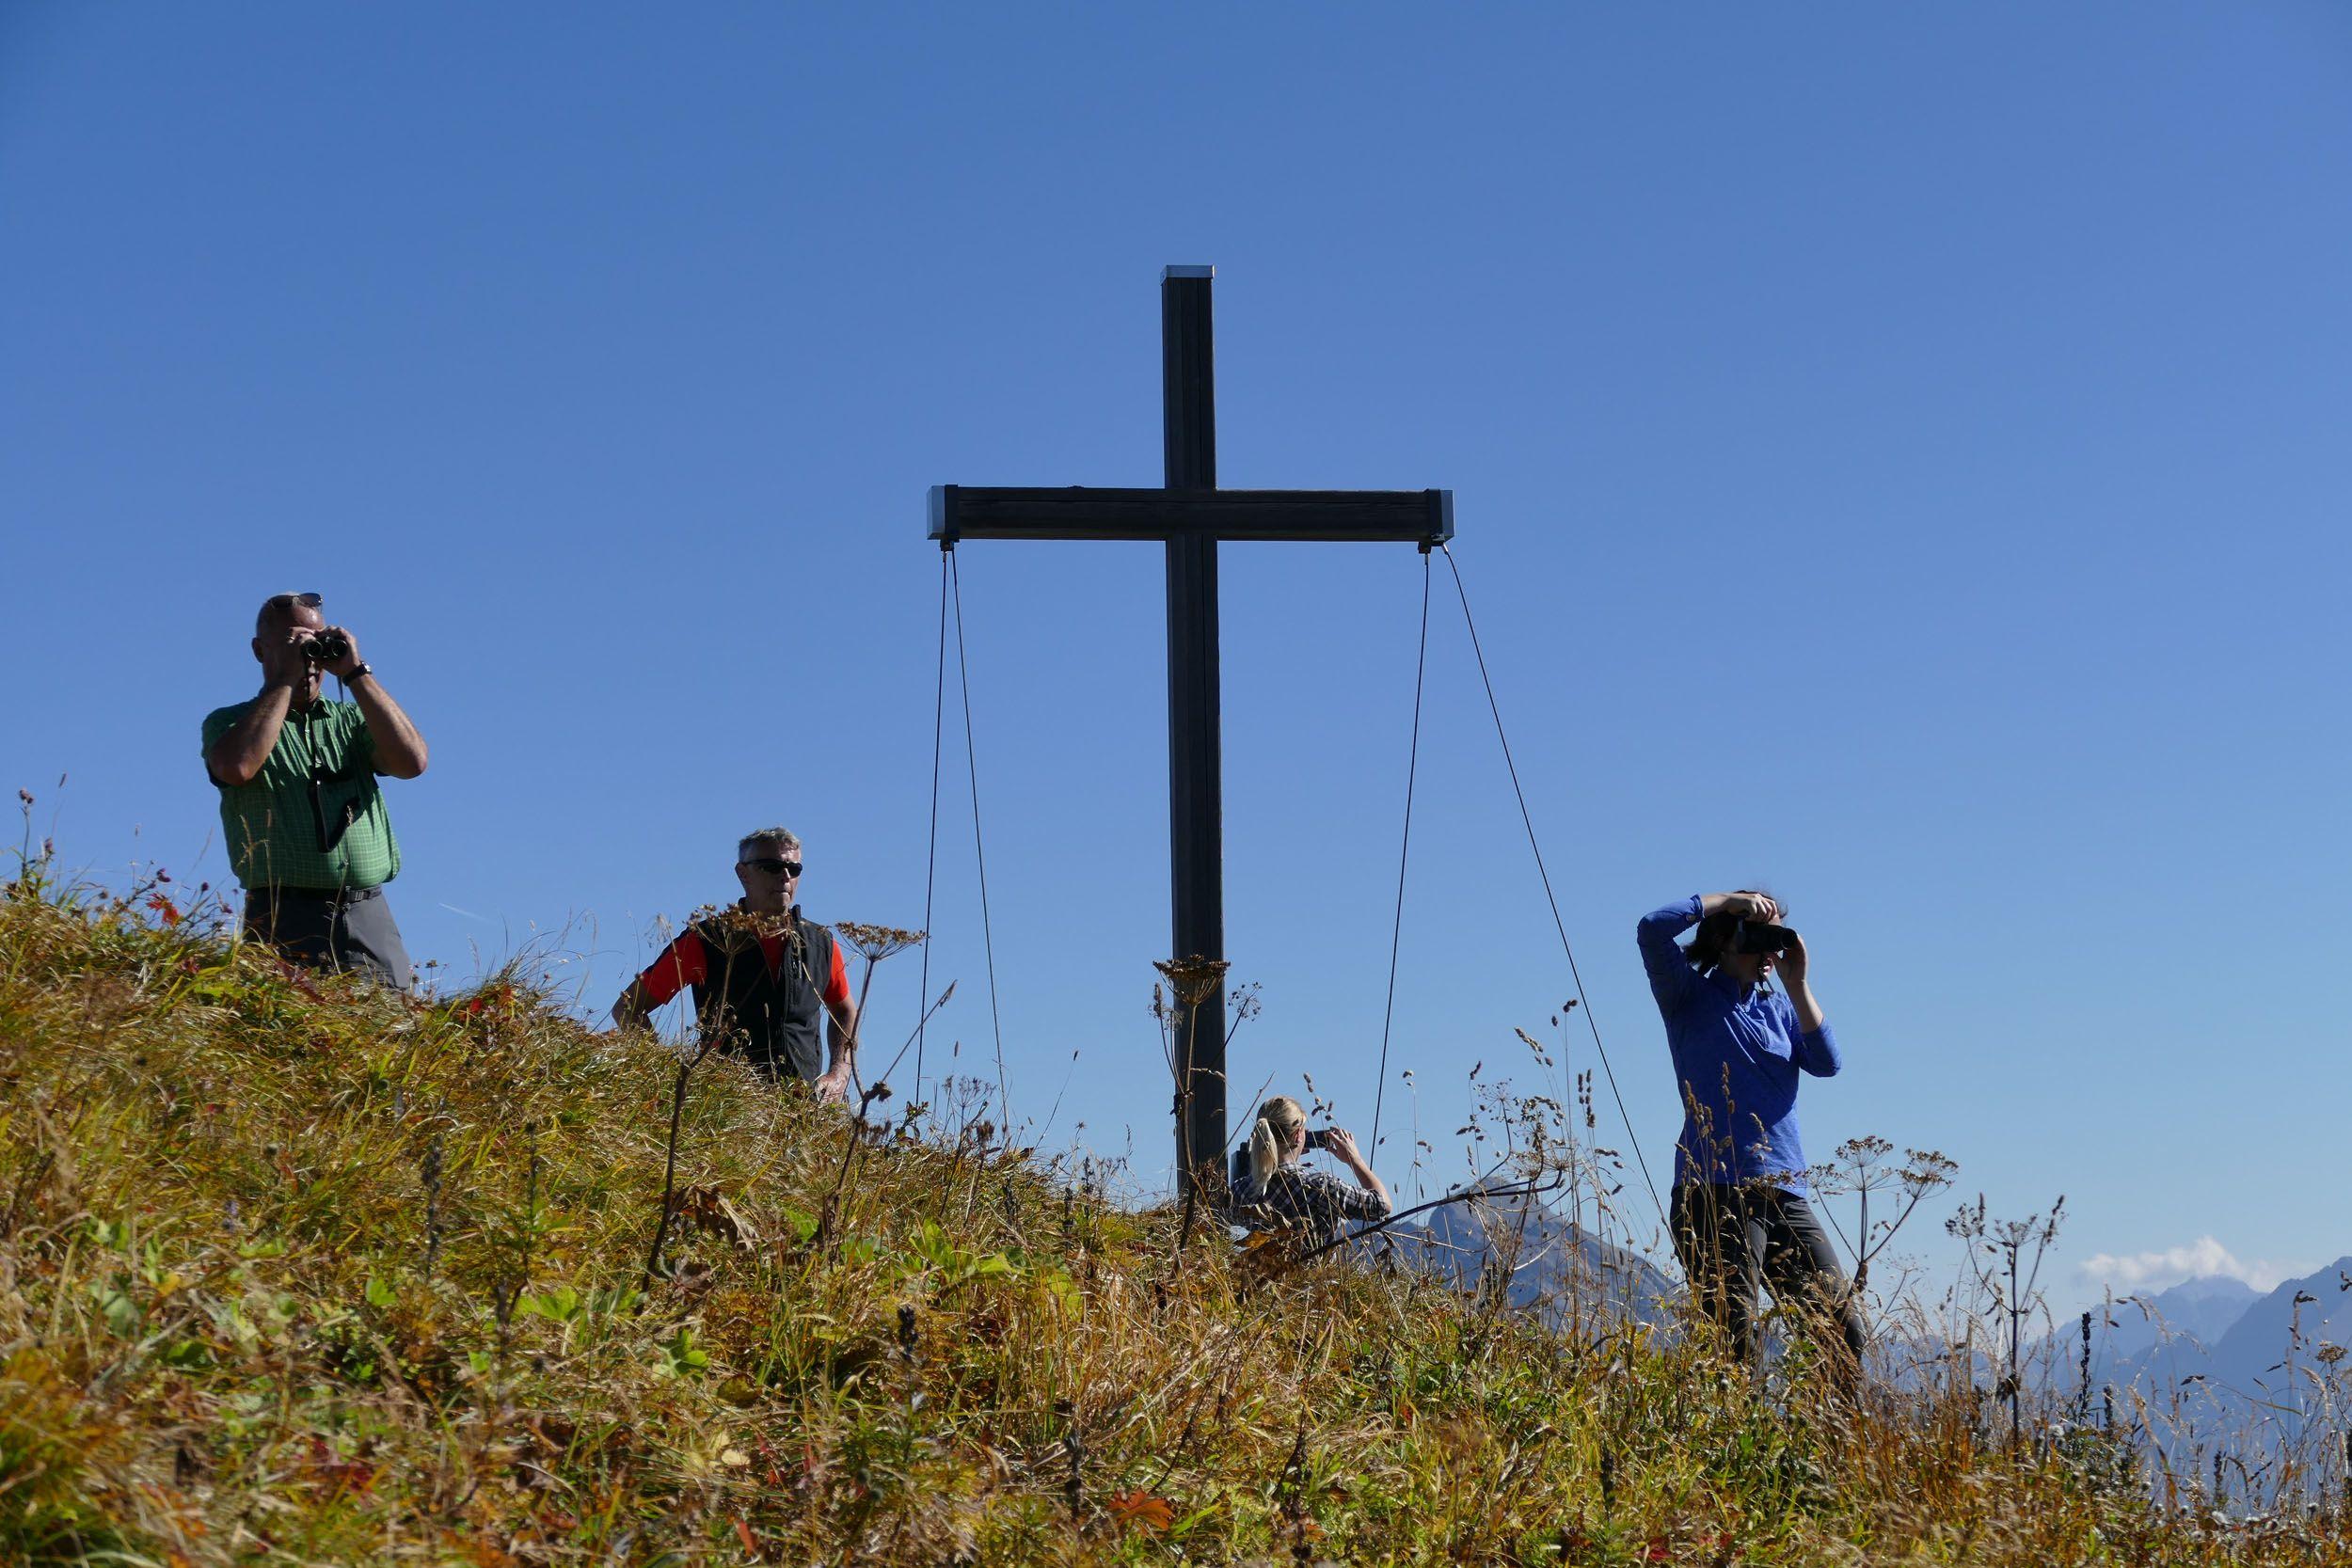 Wanderhotel Jägeralpe Höhenmeter Wandercup